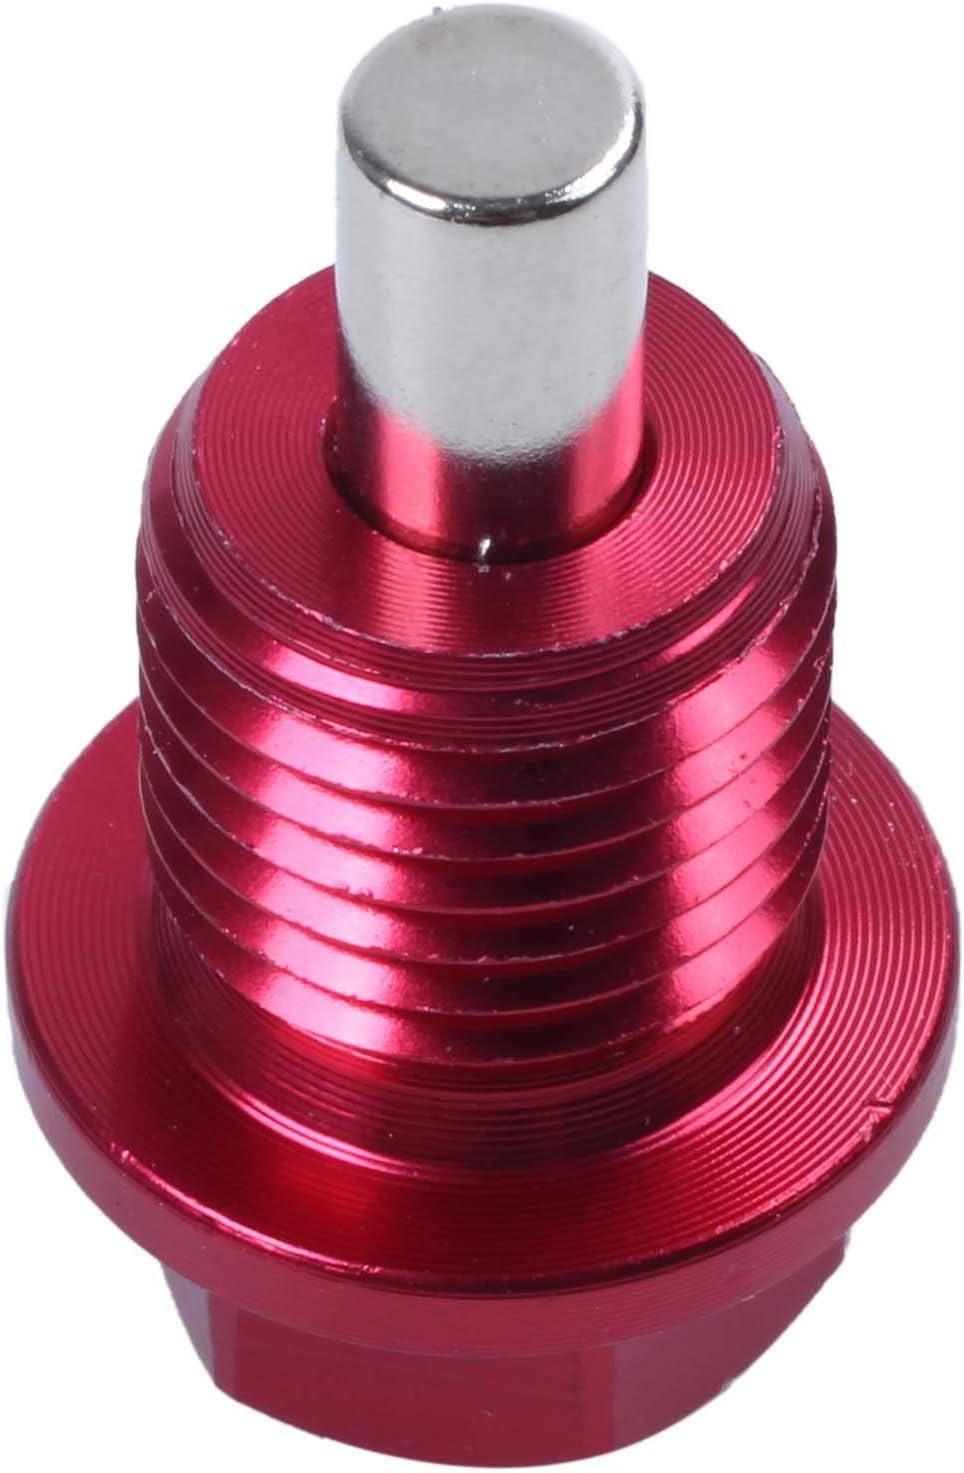 Moligh doll M14x1.5 Magnetic Oil Pan Drain Bolt Plug For //////Mitsubishi//Red